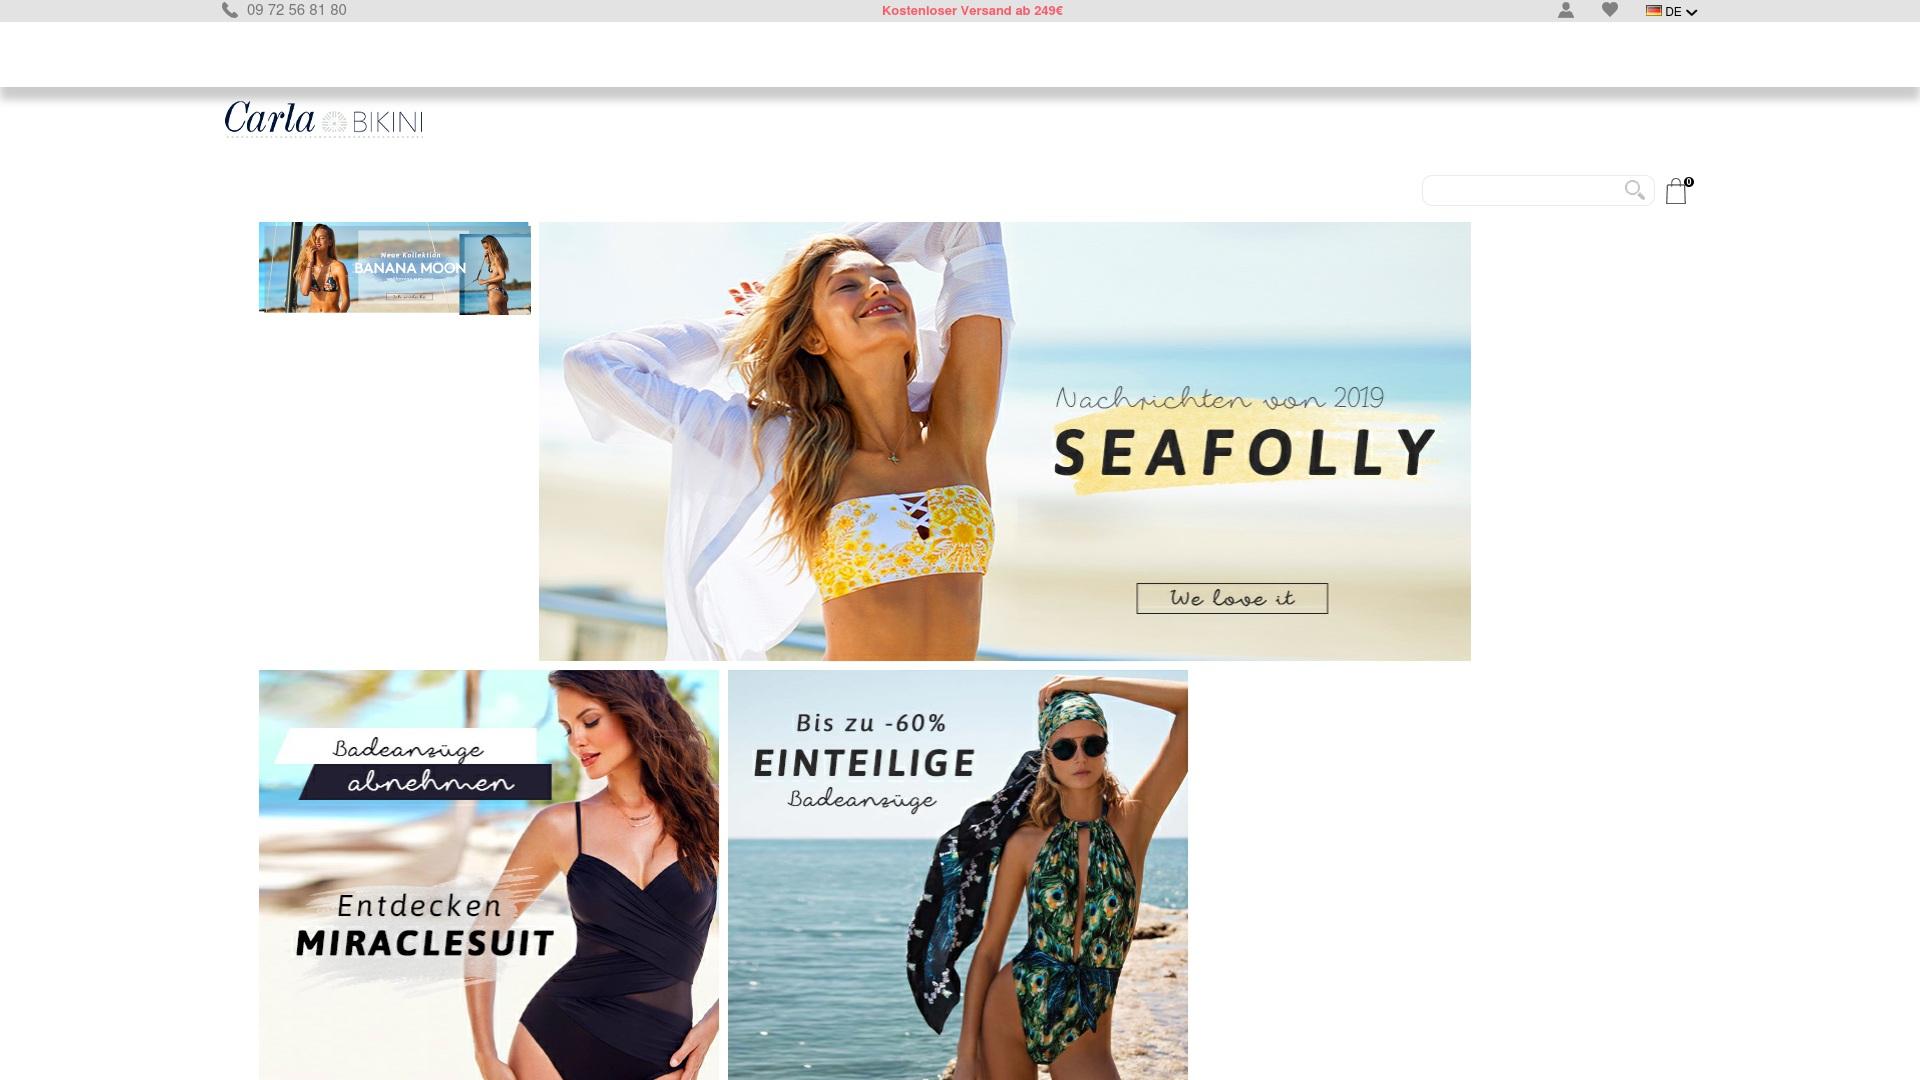 Gutschein für Carla-bikini: Rabatte für  Carla-bikini sichern